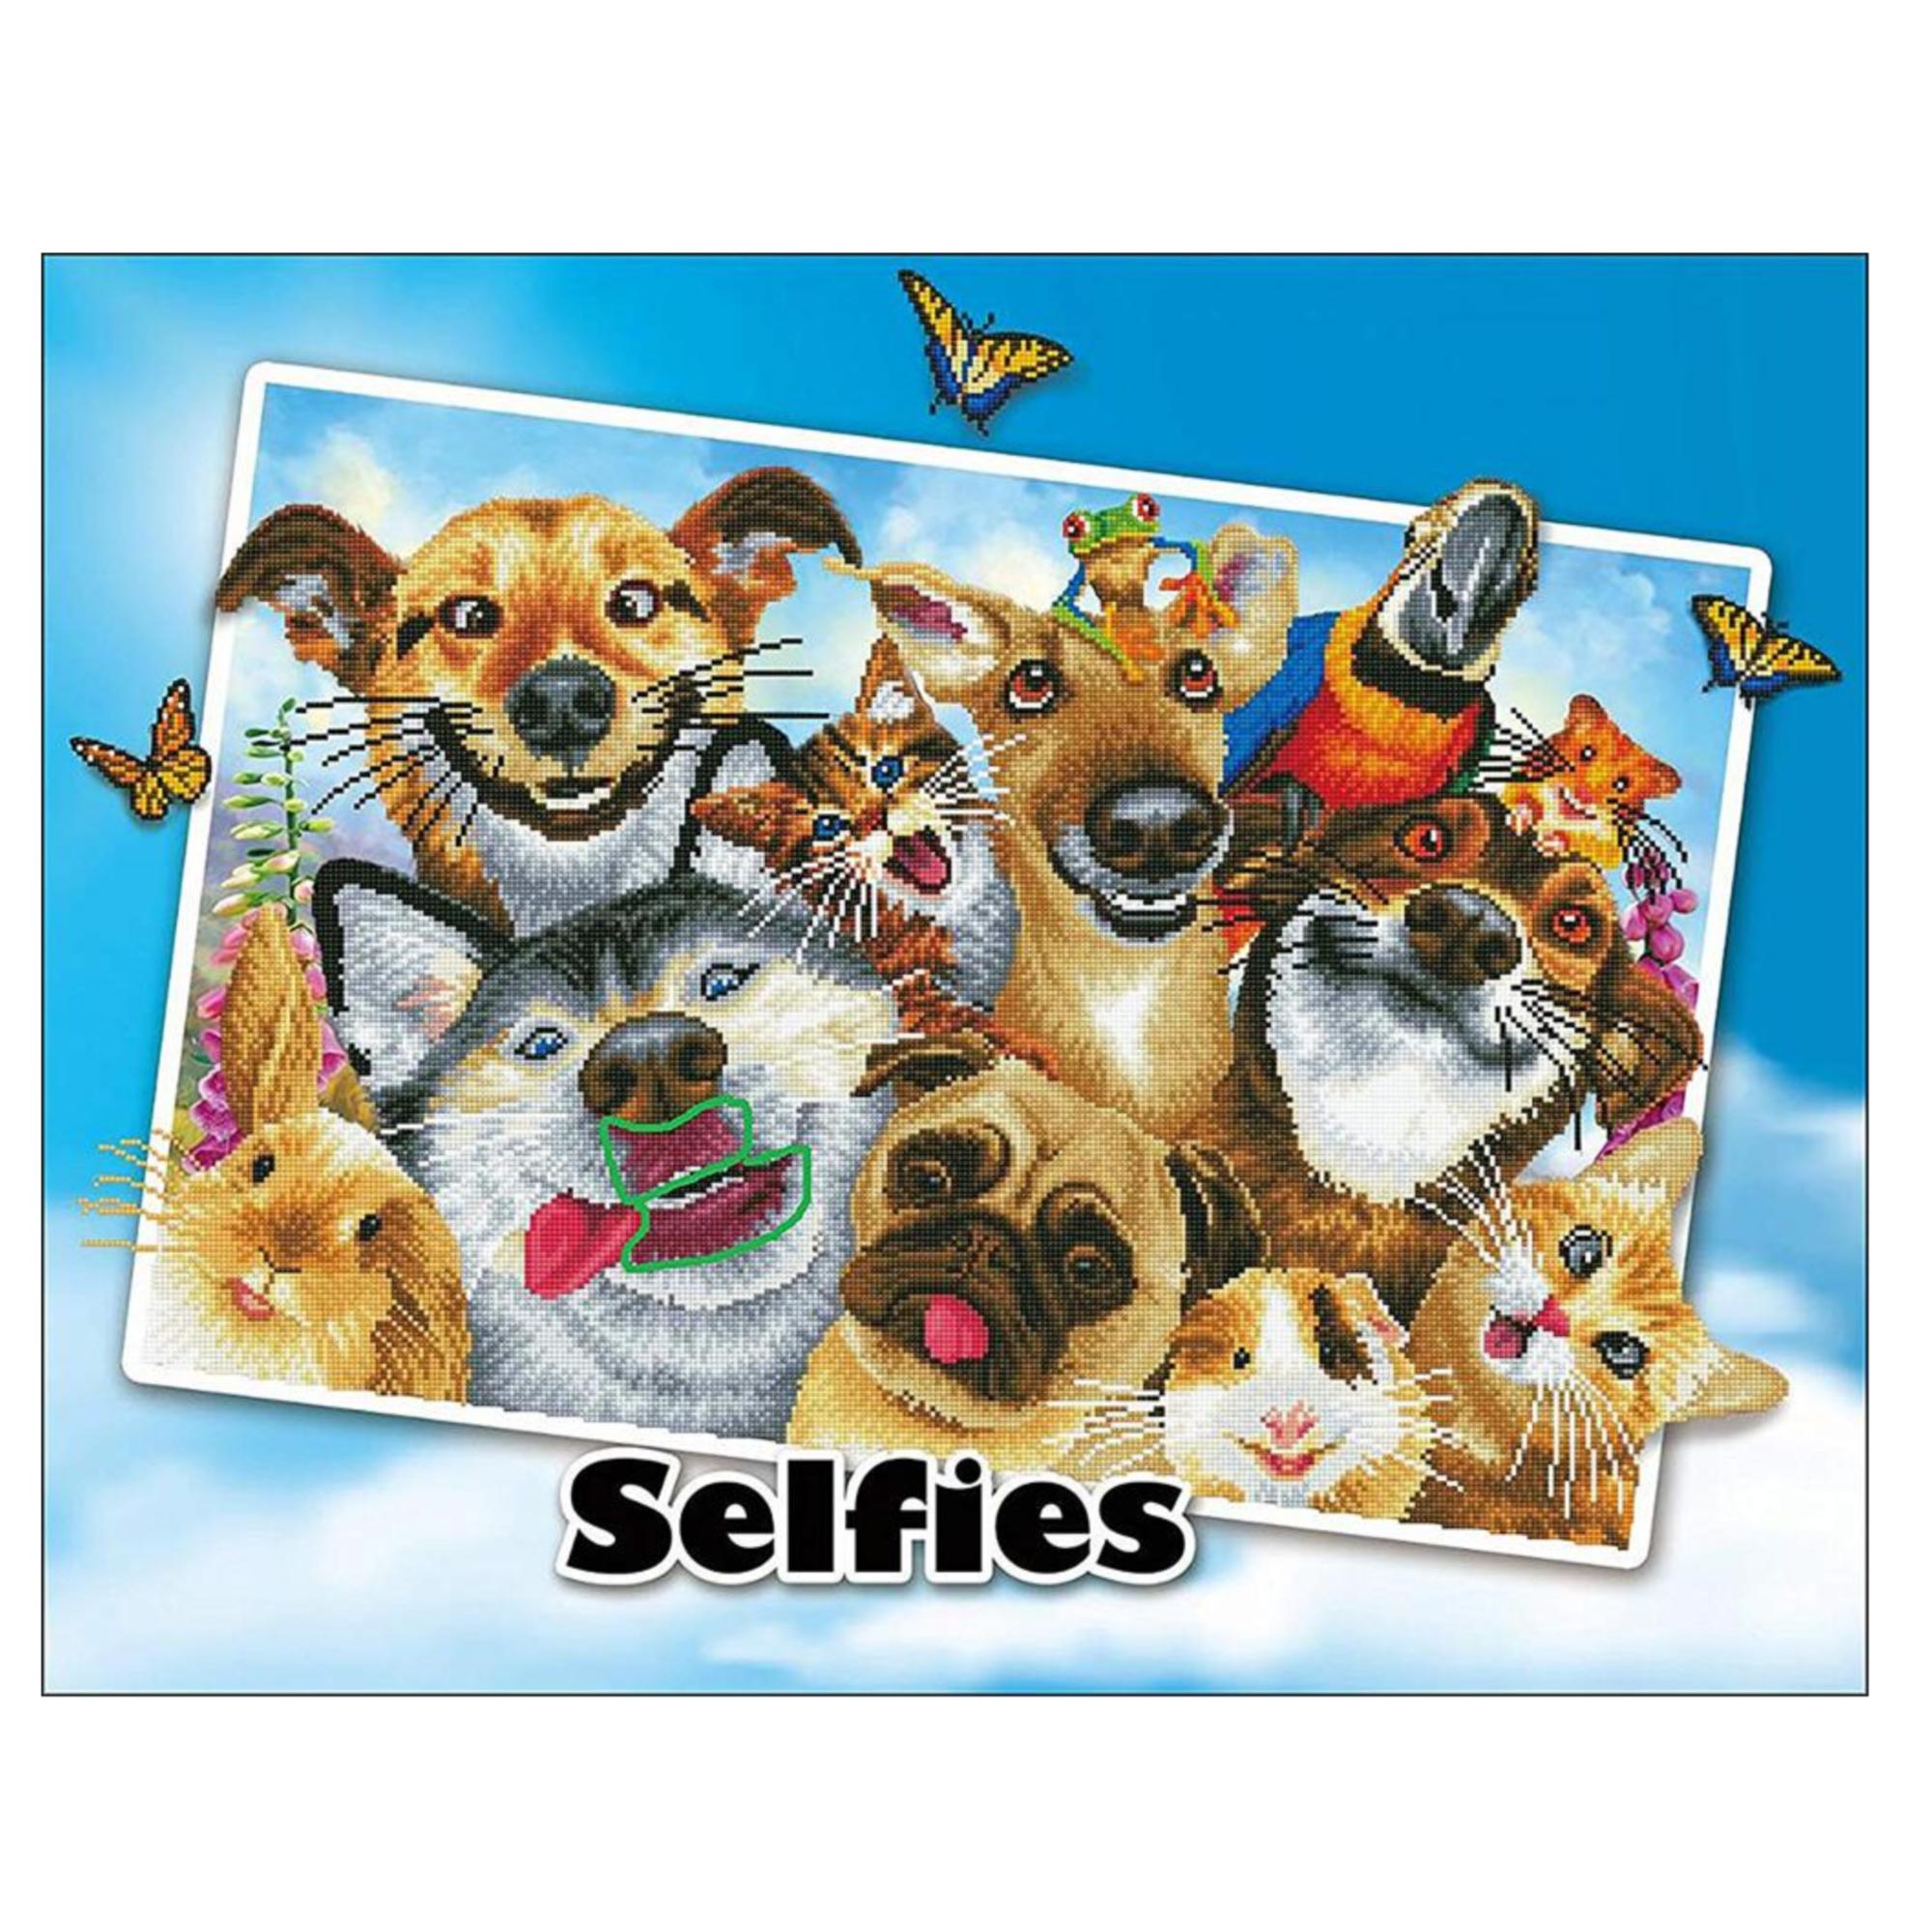 Diamond Dotz Diamond Dotz - Selfies: Love You!